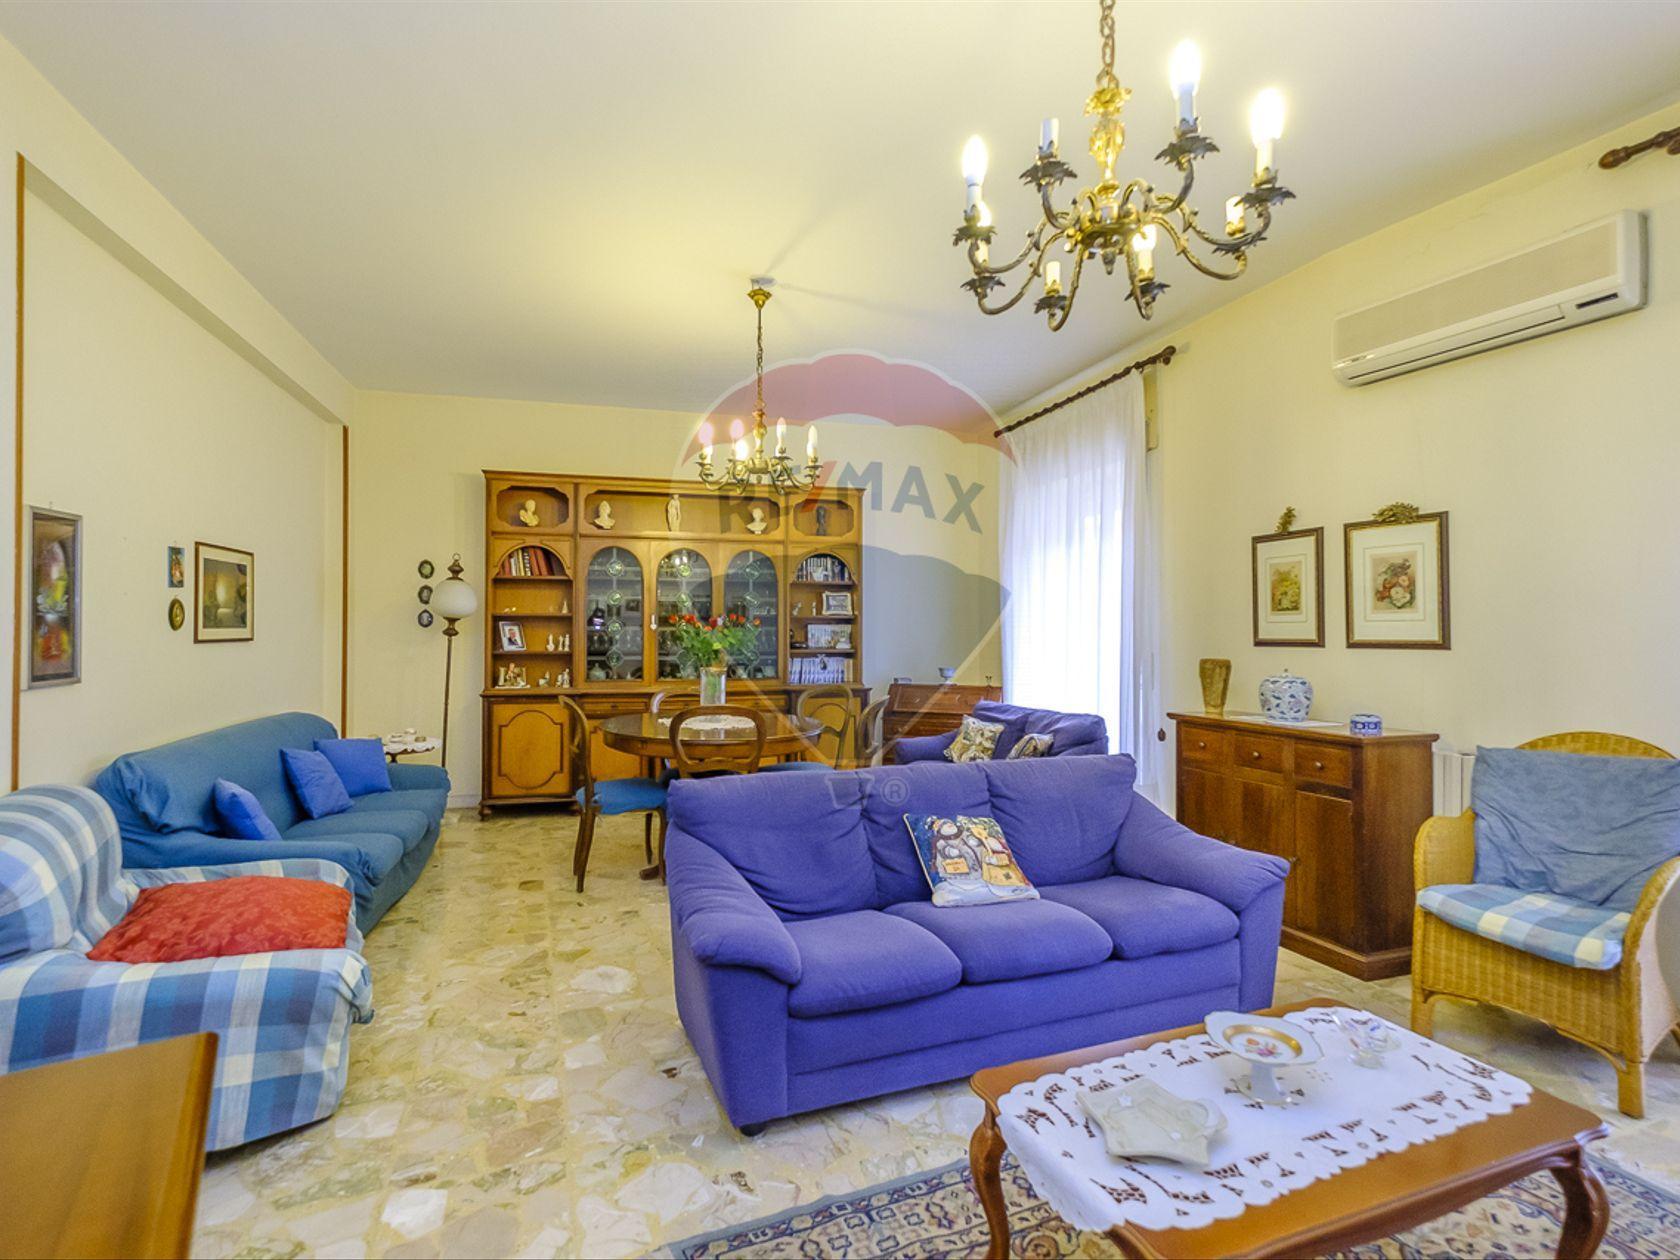 Appartamento Siracusa- Scala Greca S. Panagia Teracati Zecchino, Siracusa, SR Vendita - Foto 3